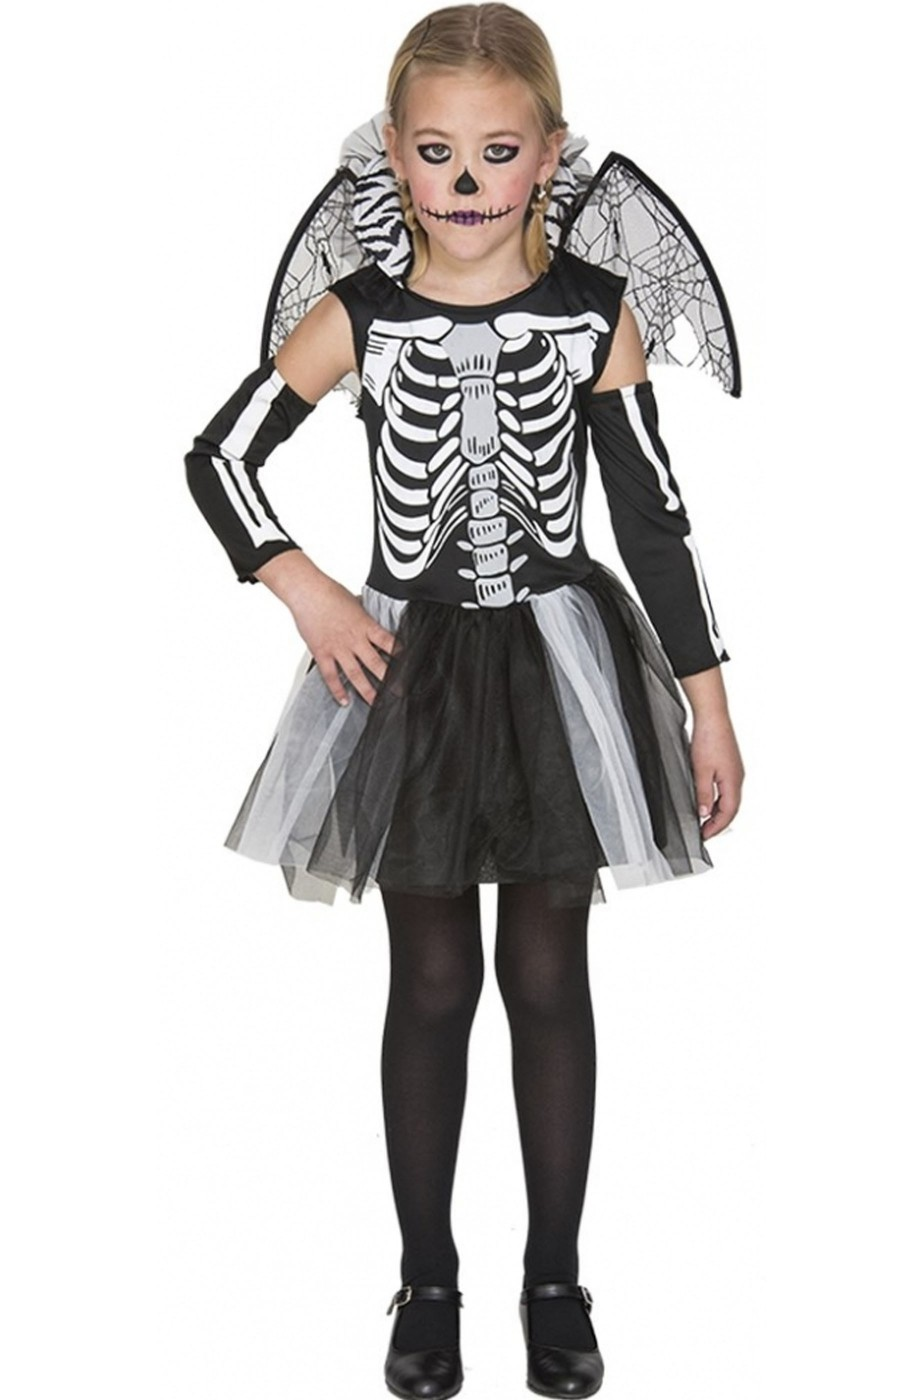 Costume per Halloween da bambina da scheletro 17bfe560a35